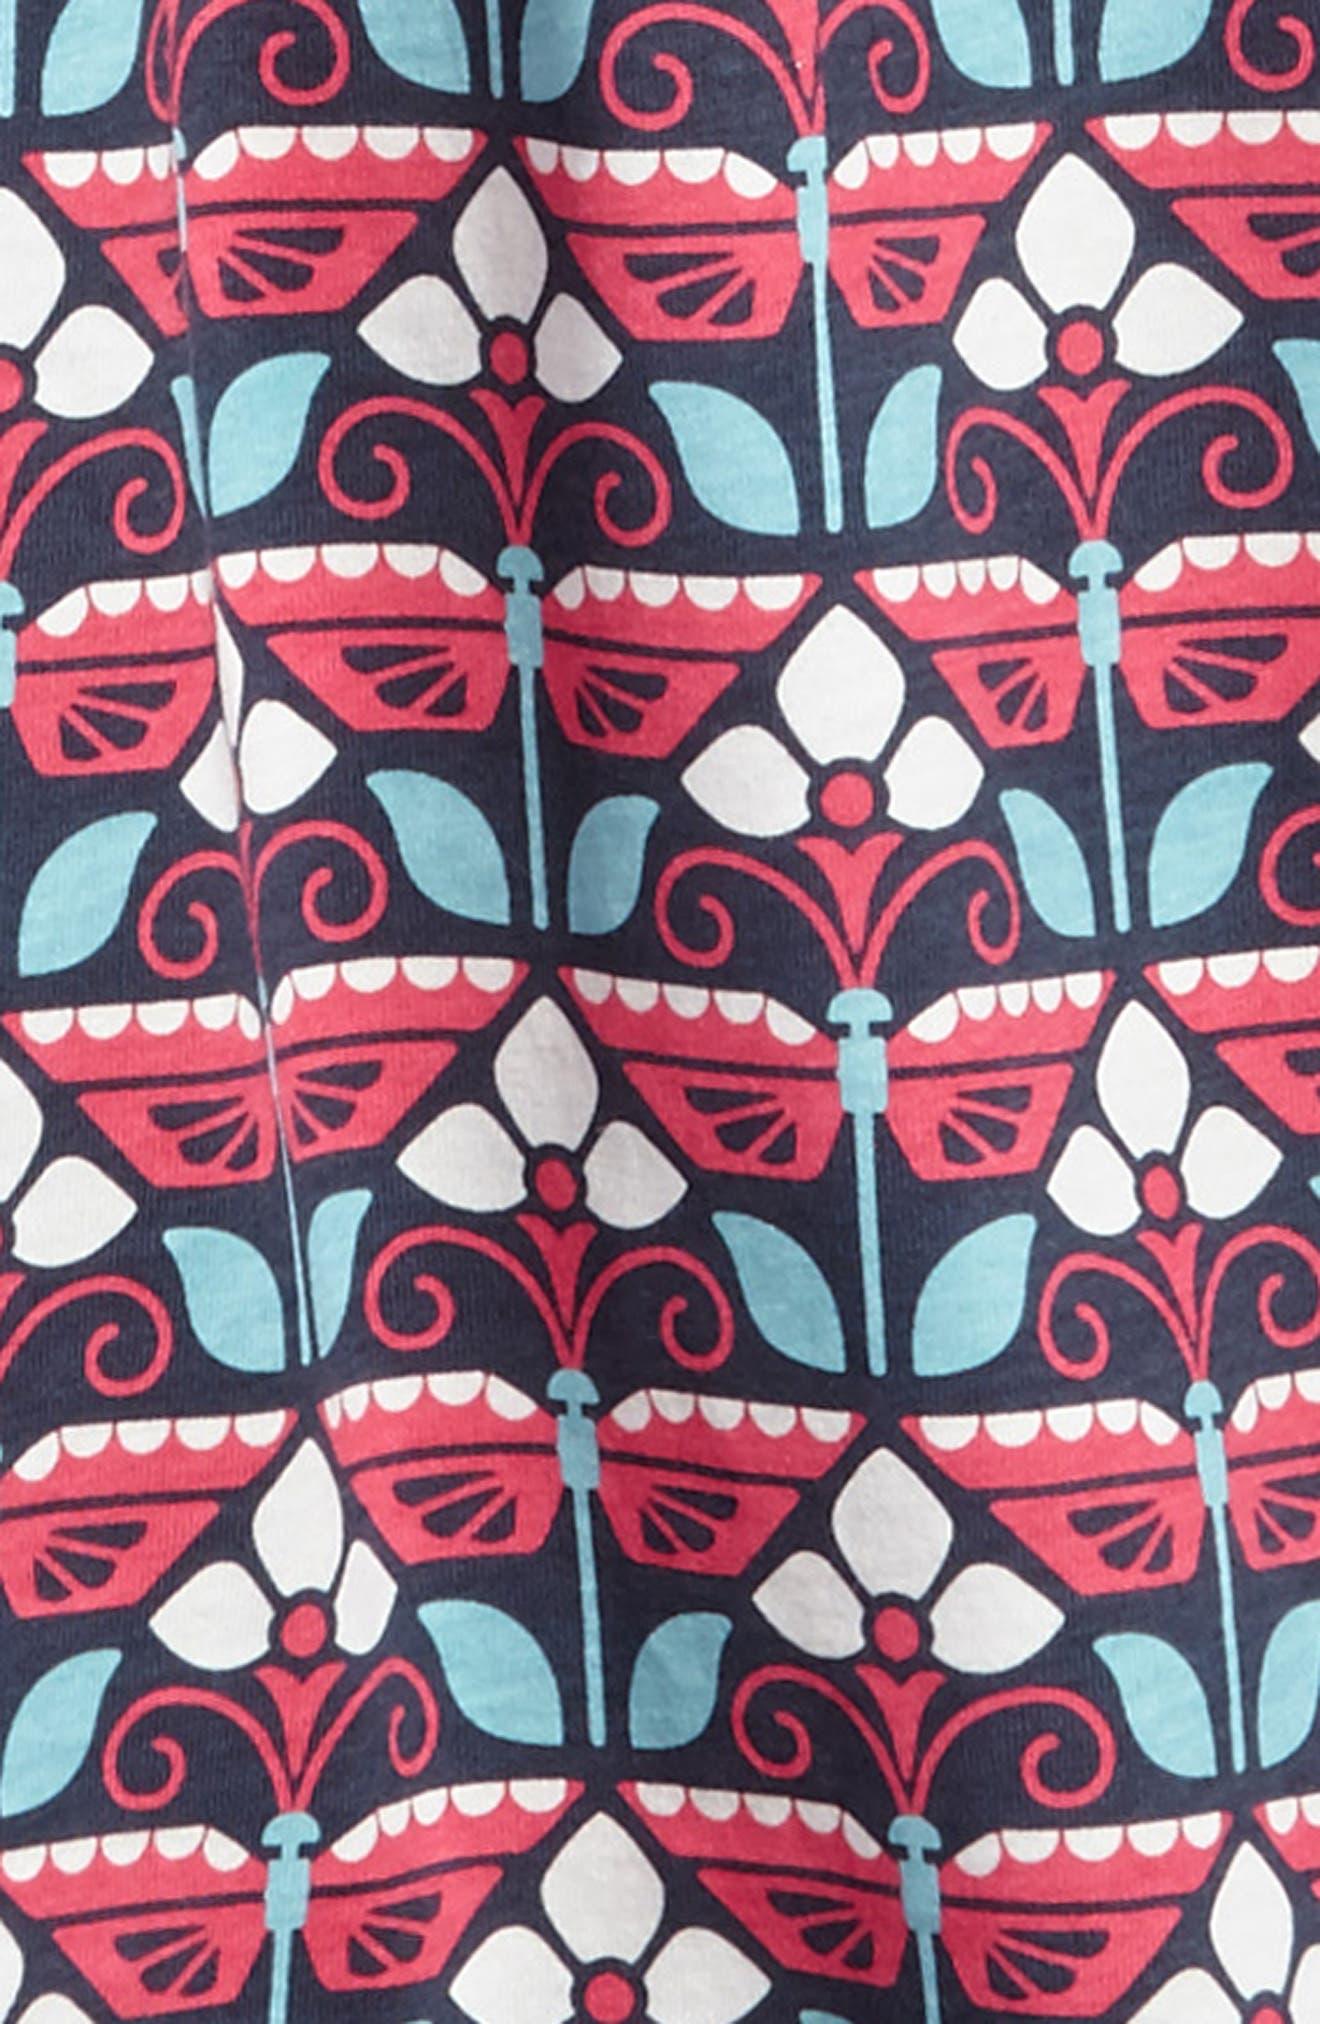 Kaleidoscope Dress,                             Alternate thumbnail 3, color,                             411